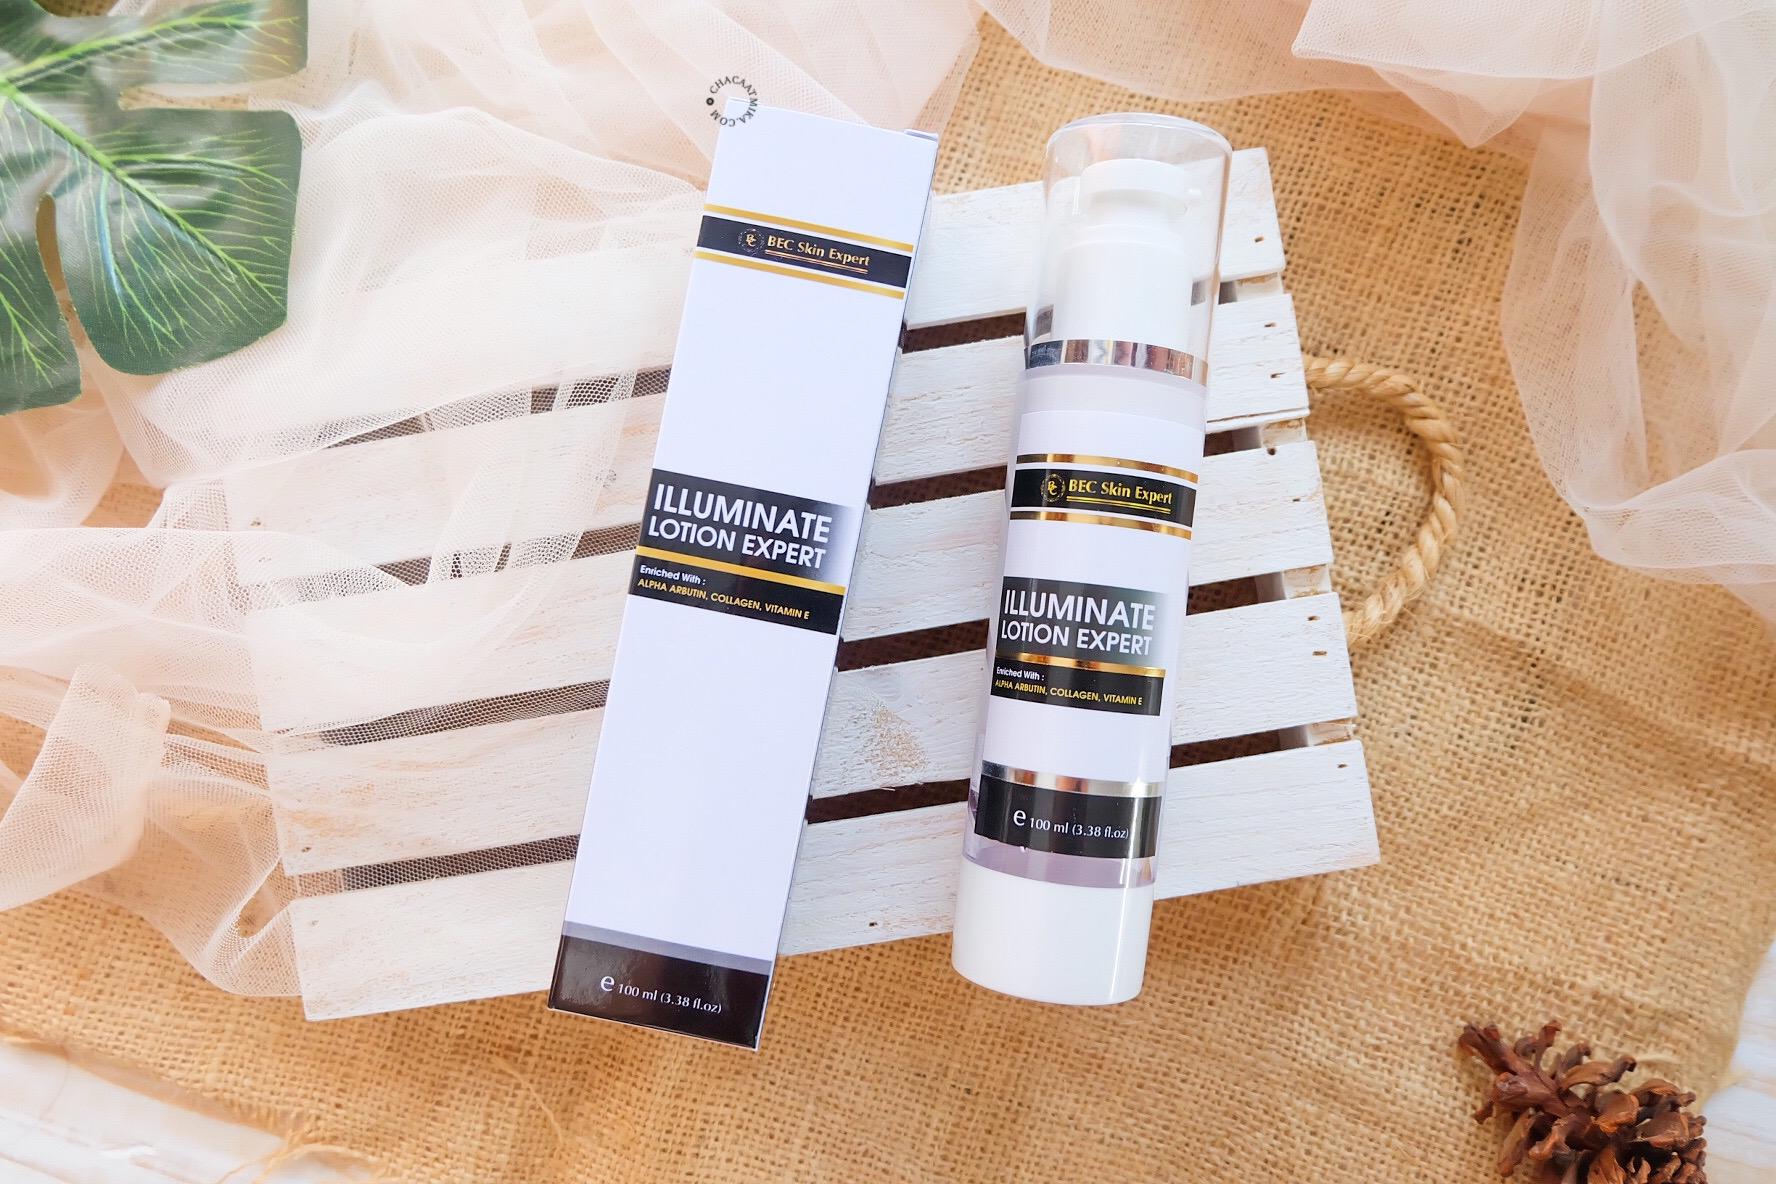 Review Illuminate Lotion Expert BEC Skin Expert